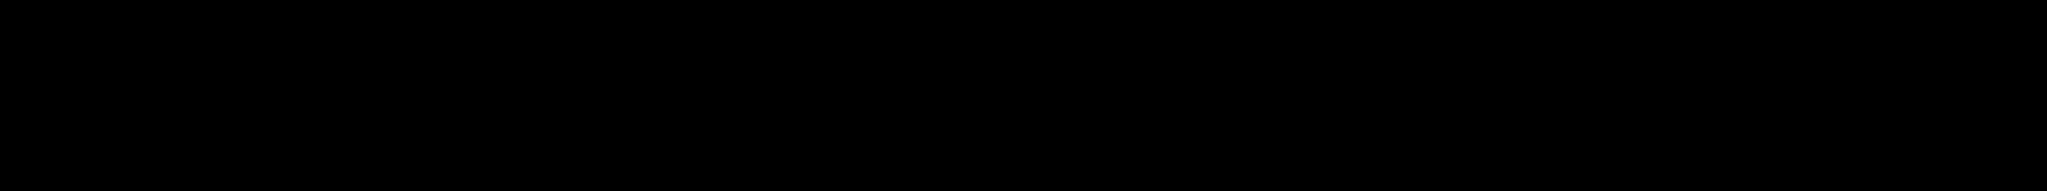 Design System F 300R